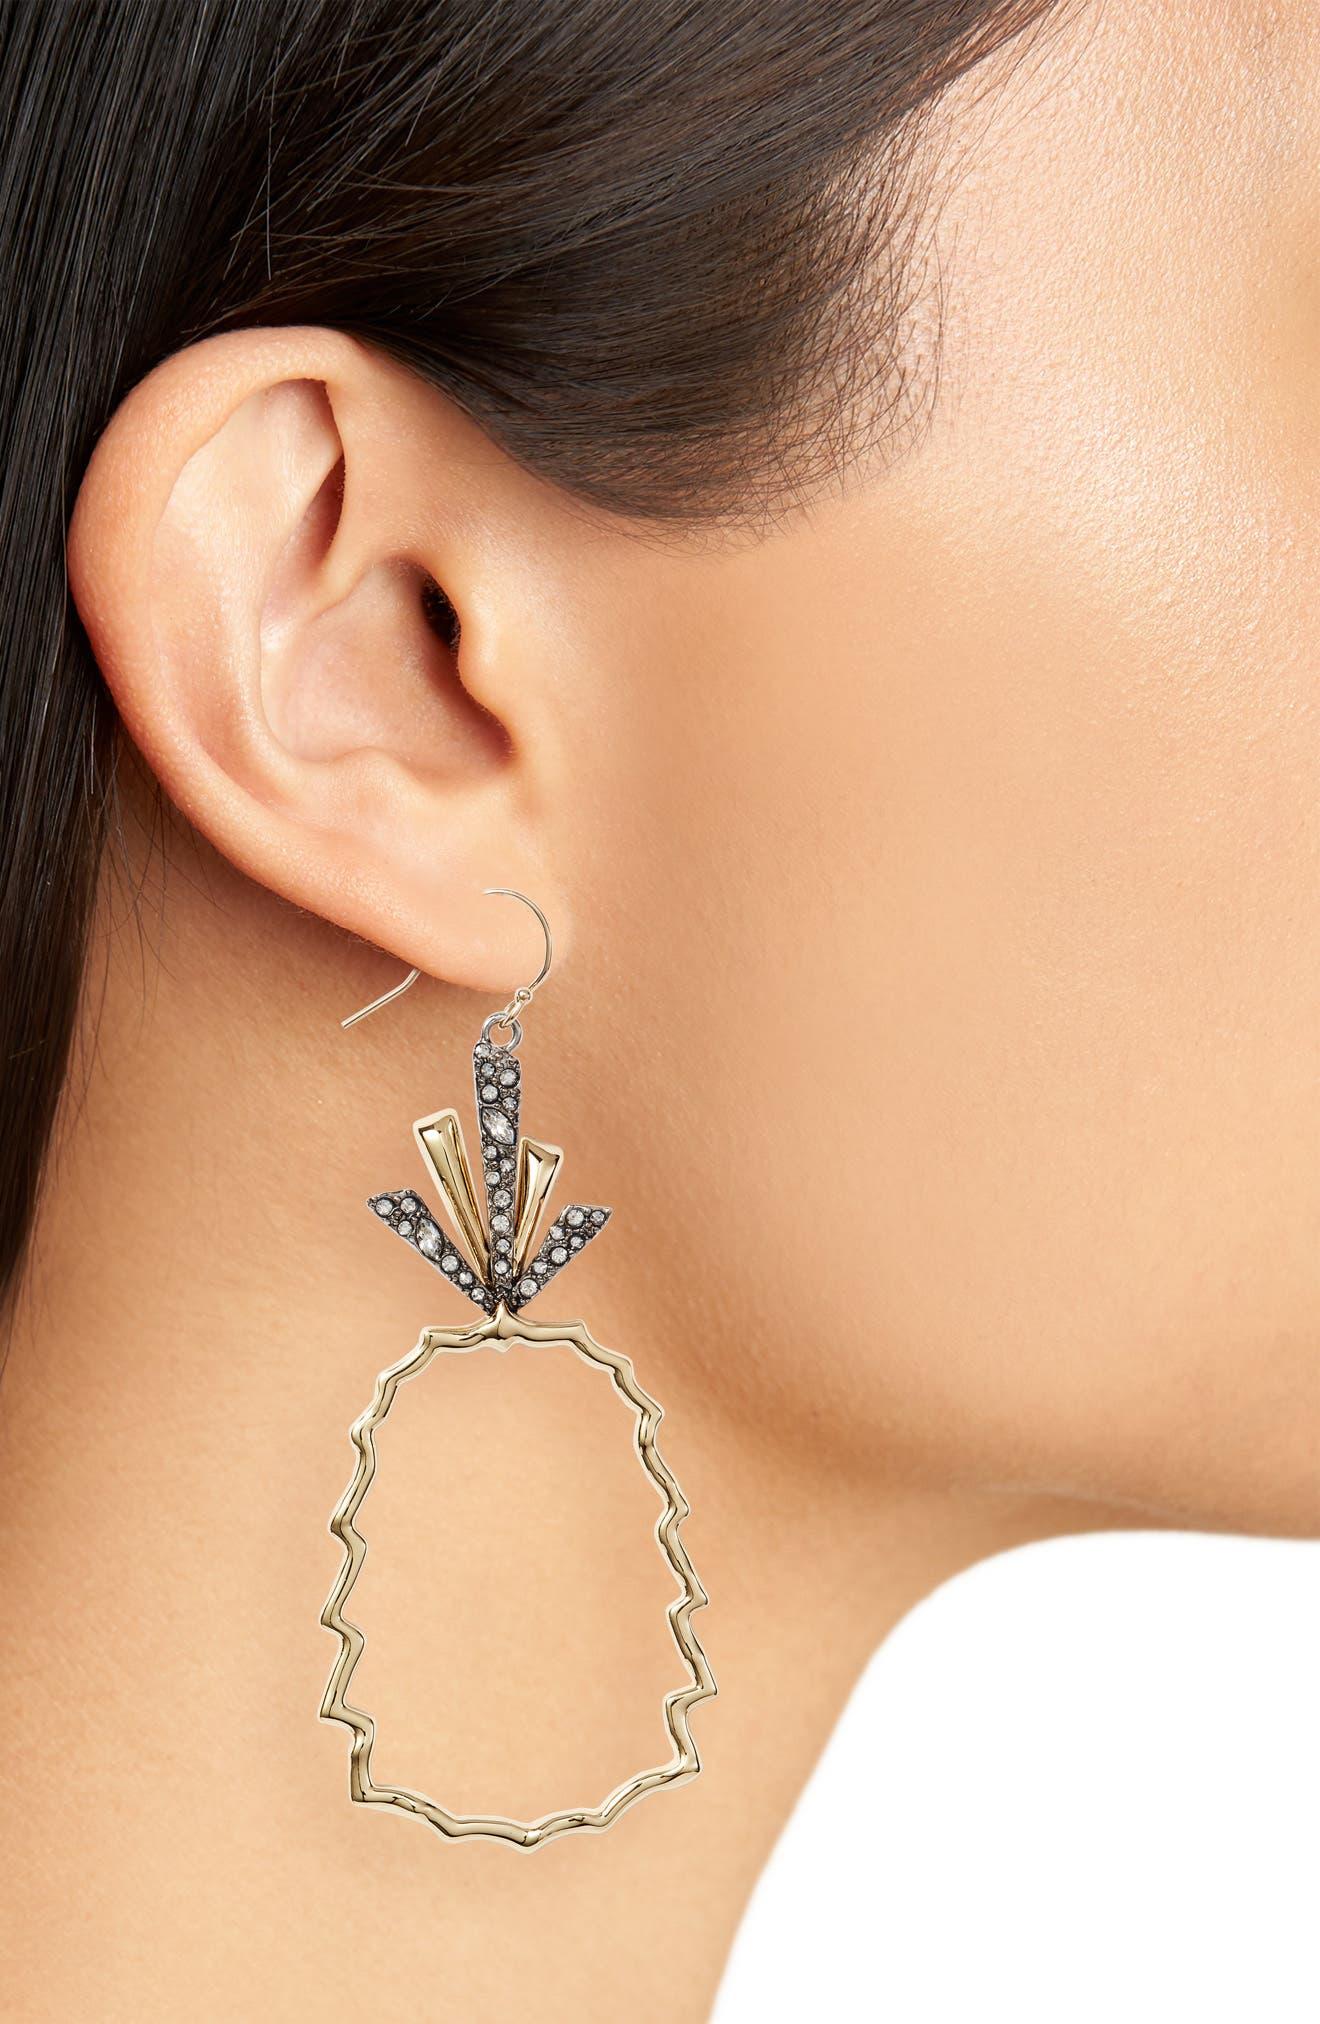 Crystal Leaf Pineapple Earrings,                             Alternate thumbnail 2, color,                             GOLD